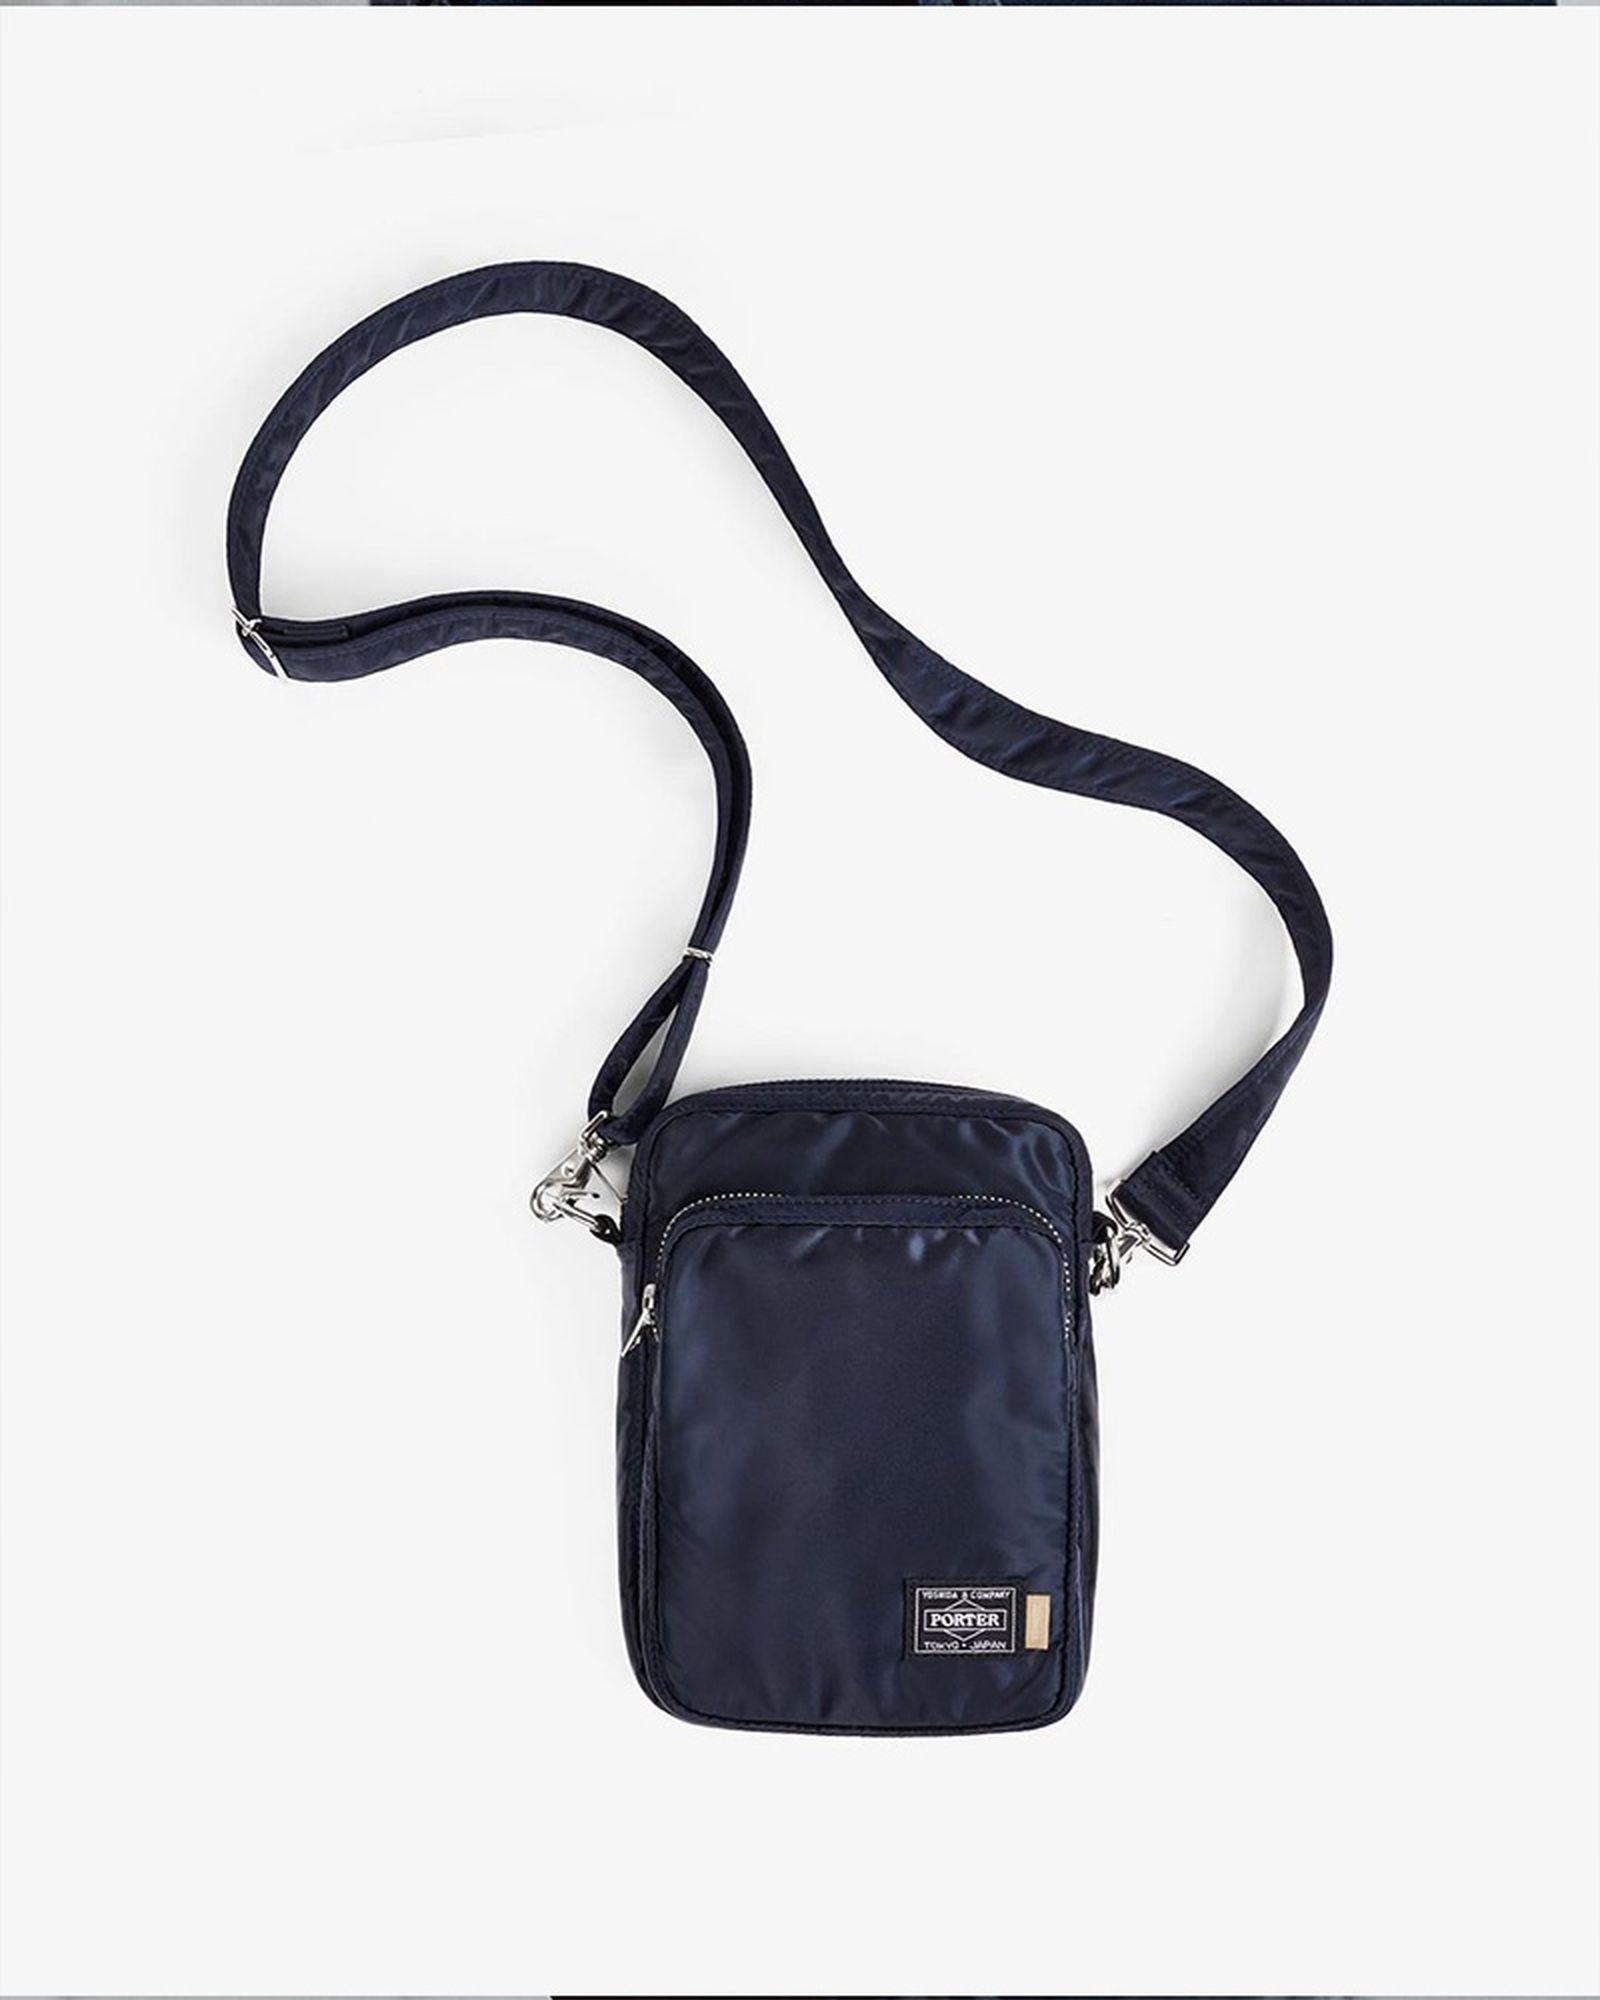 jjjjound-porter-bags-release-date-info-06